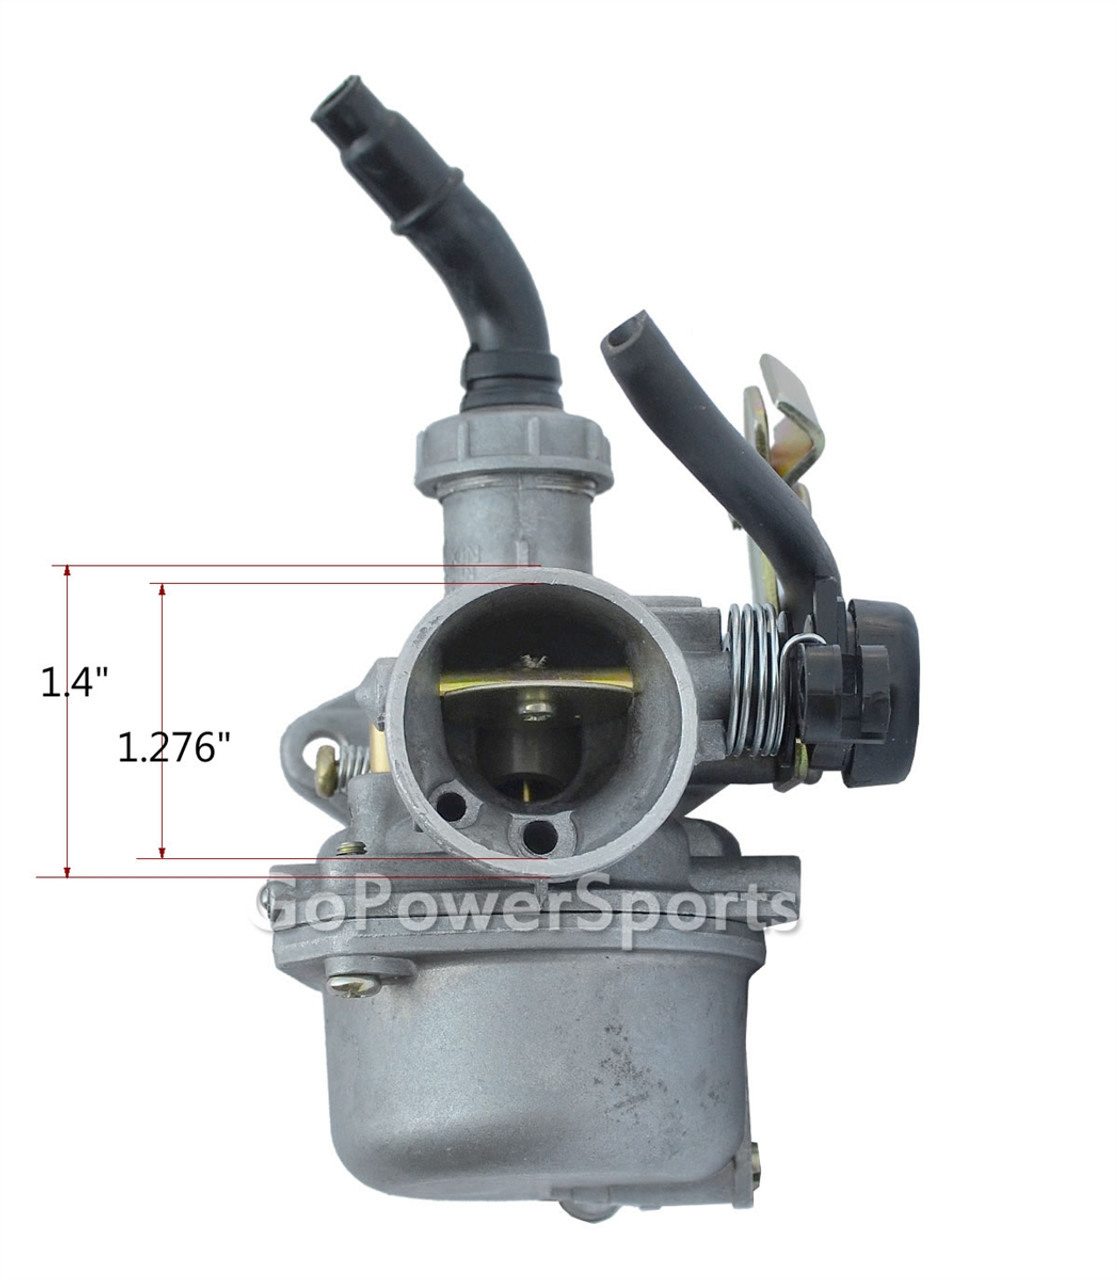 110cc carburetor gopowersports com 49cc bicycle engine wiring diagram previous kd110carb kd110carb pz19000110g000 kd110carb 110cc carburetor